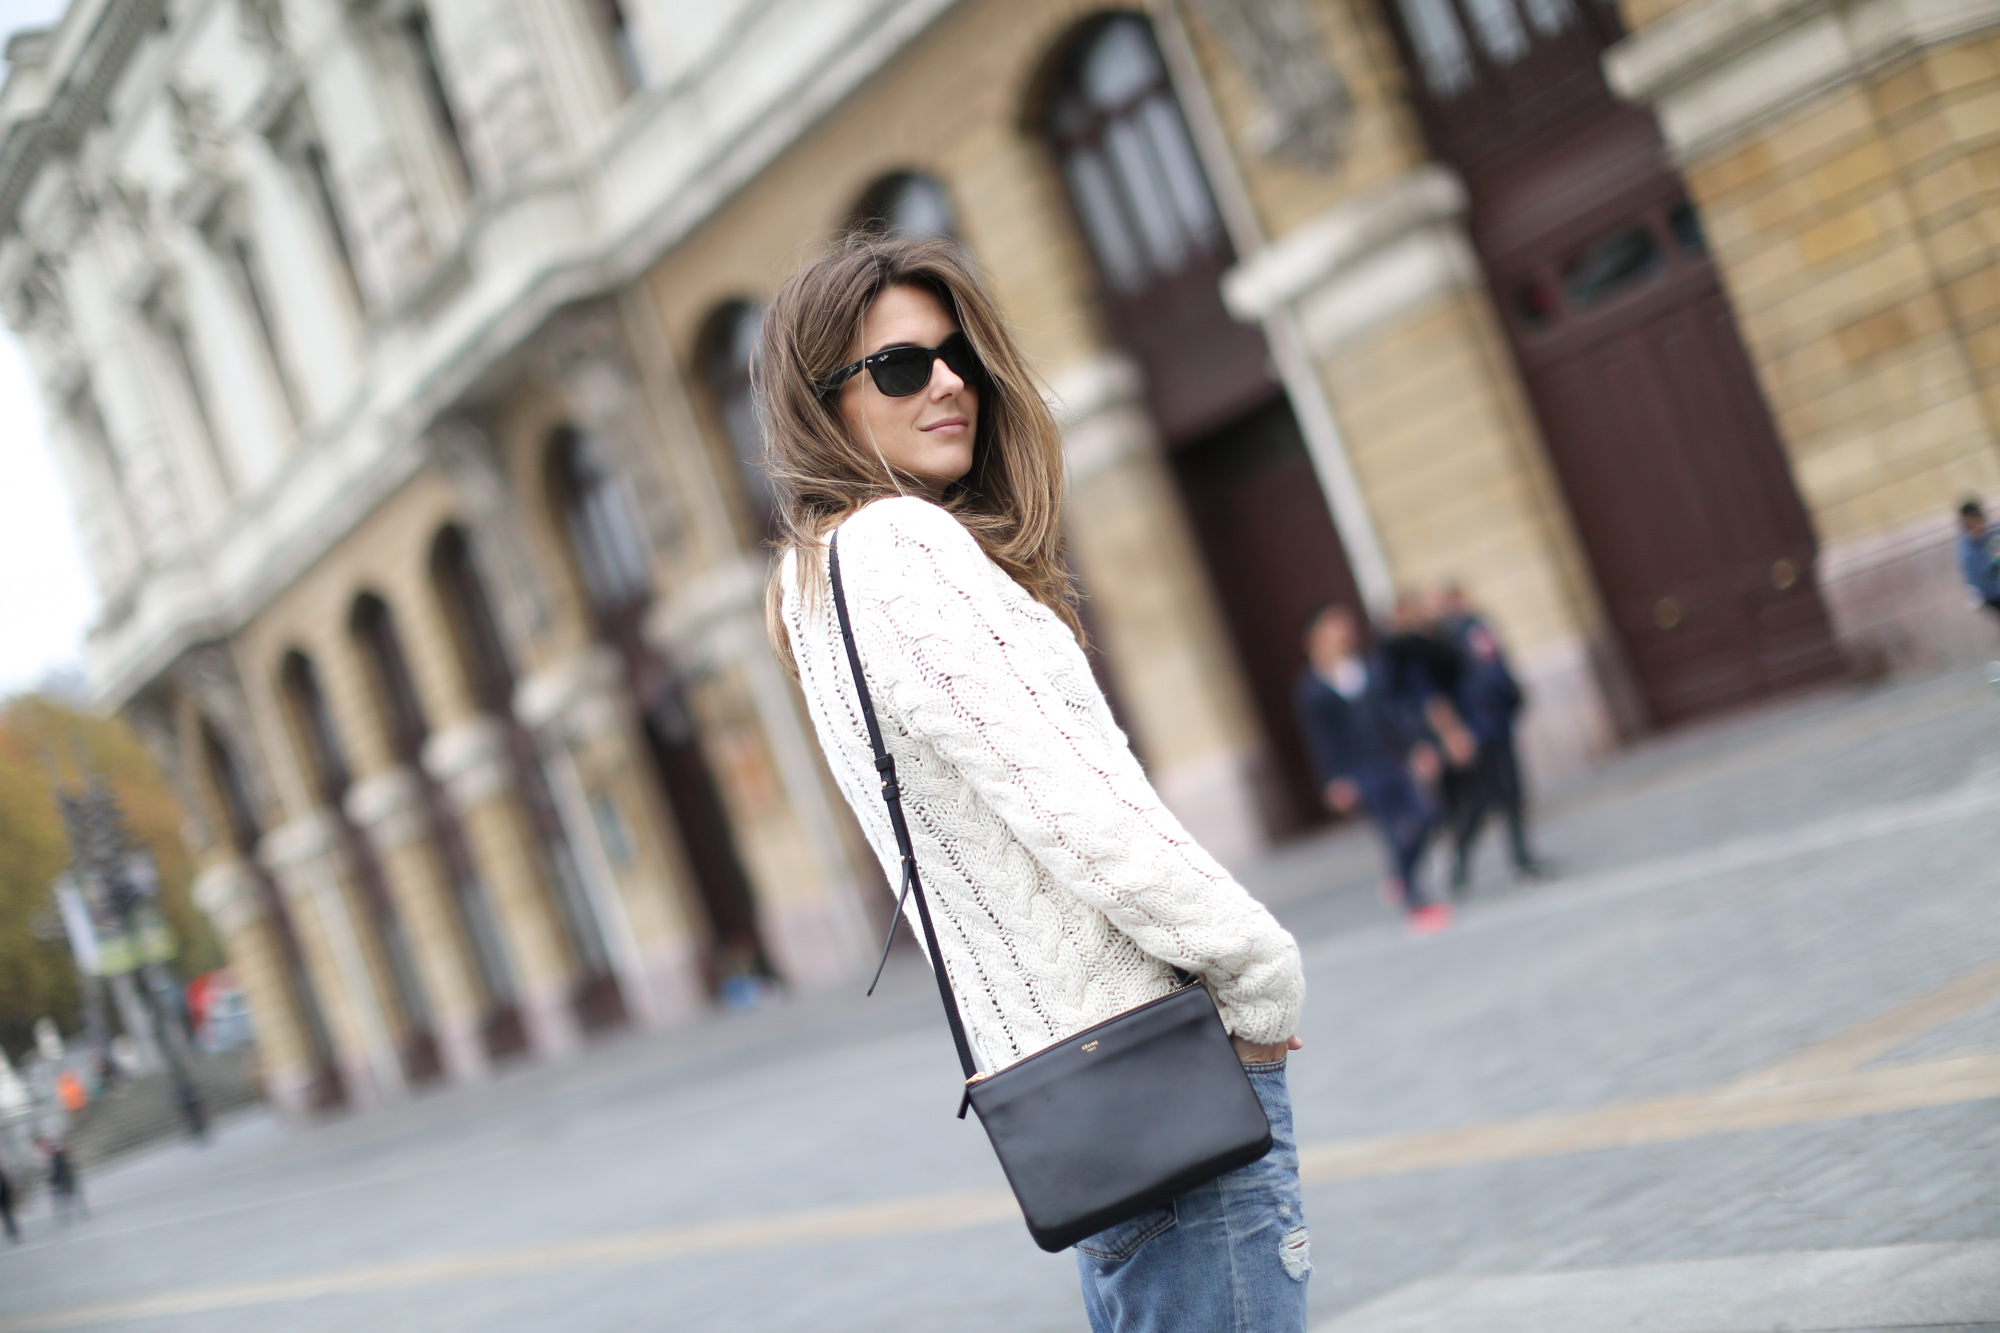 Clochet-streetstyle-isabel-marant-etoile-ellison-parka-acne-studios-jeans-adidas-stan-smith-10